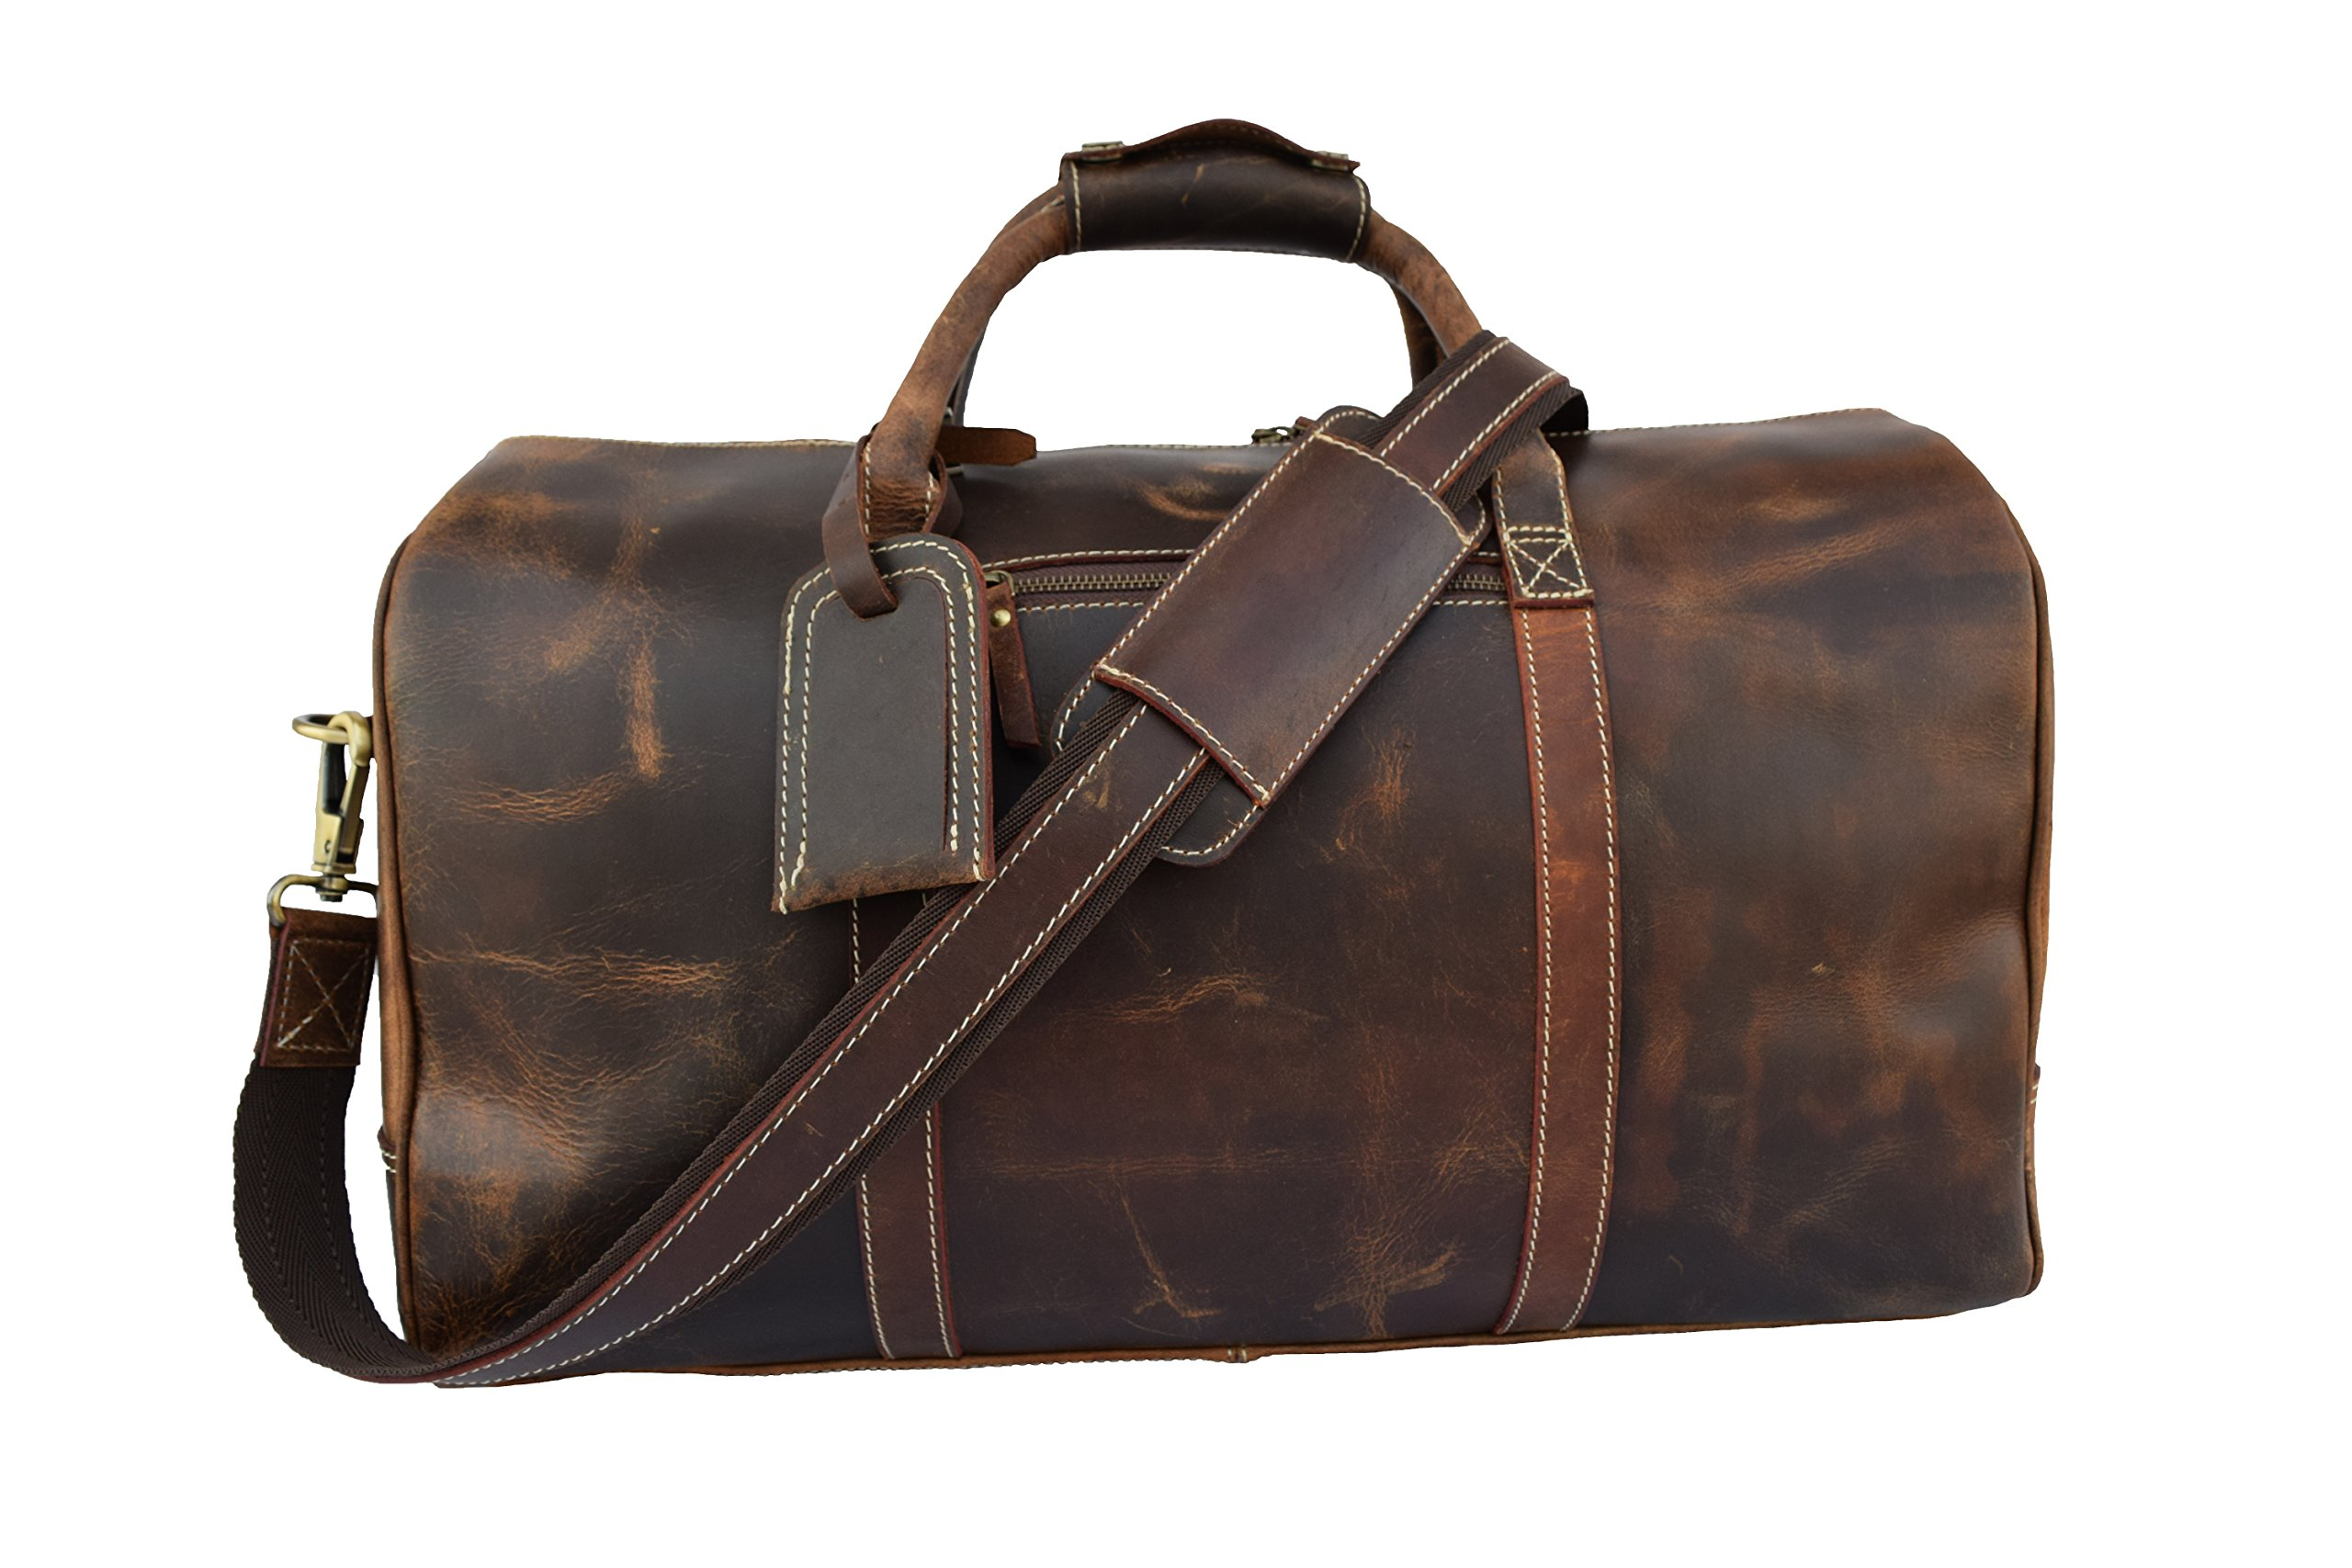 fba58a2826fc1b Genuine Vintage Leather Duffel Bag/Travel Leather Bag/Sports Gym ...